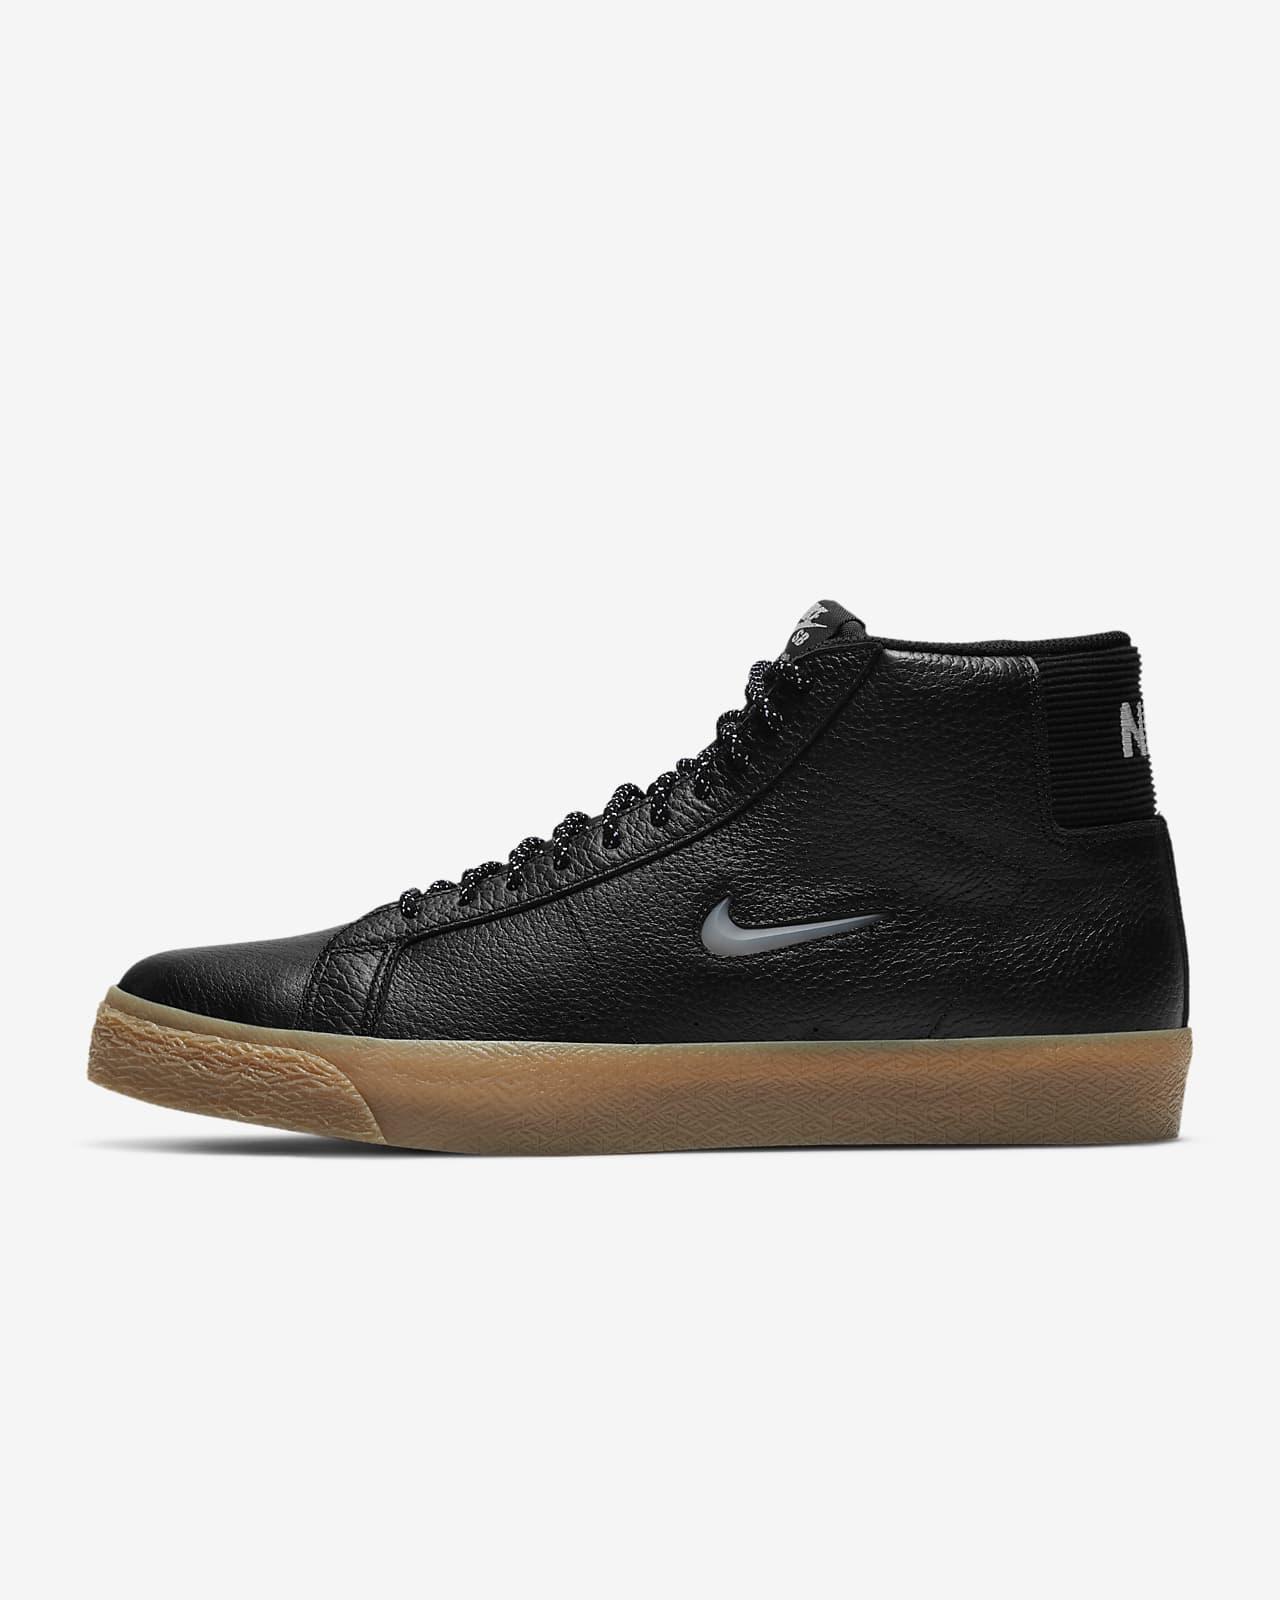 Nike SB Zoom Blazer Mid Premium Skate Shoe